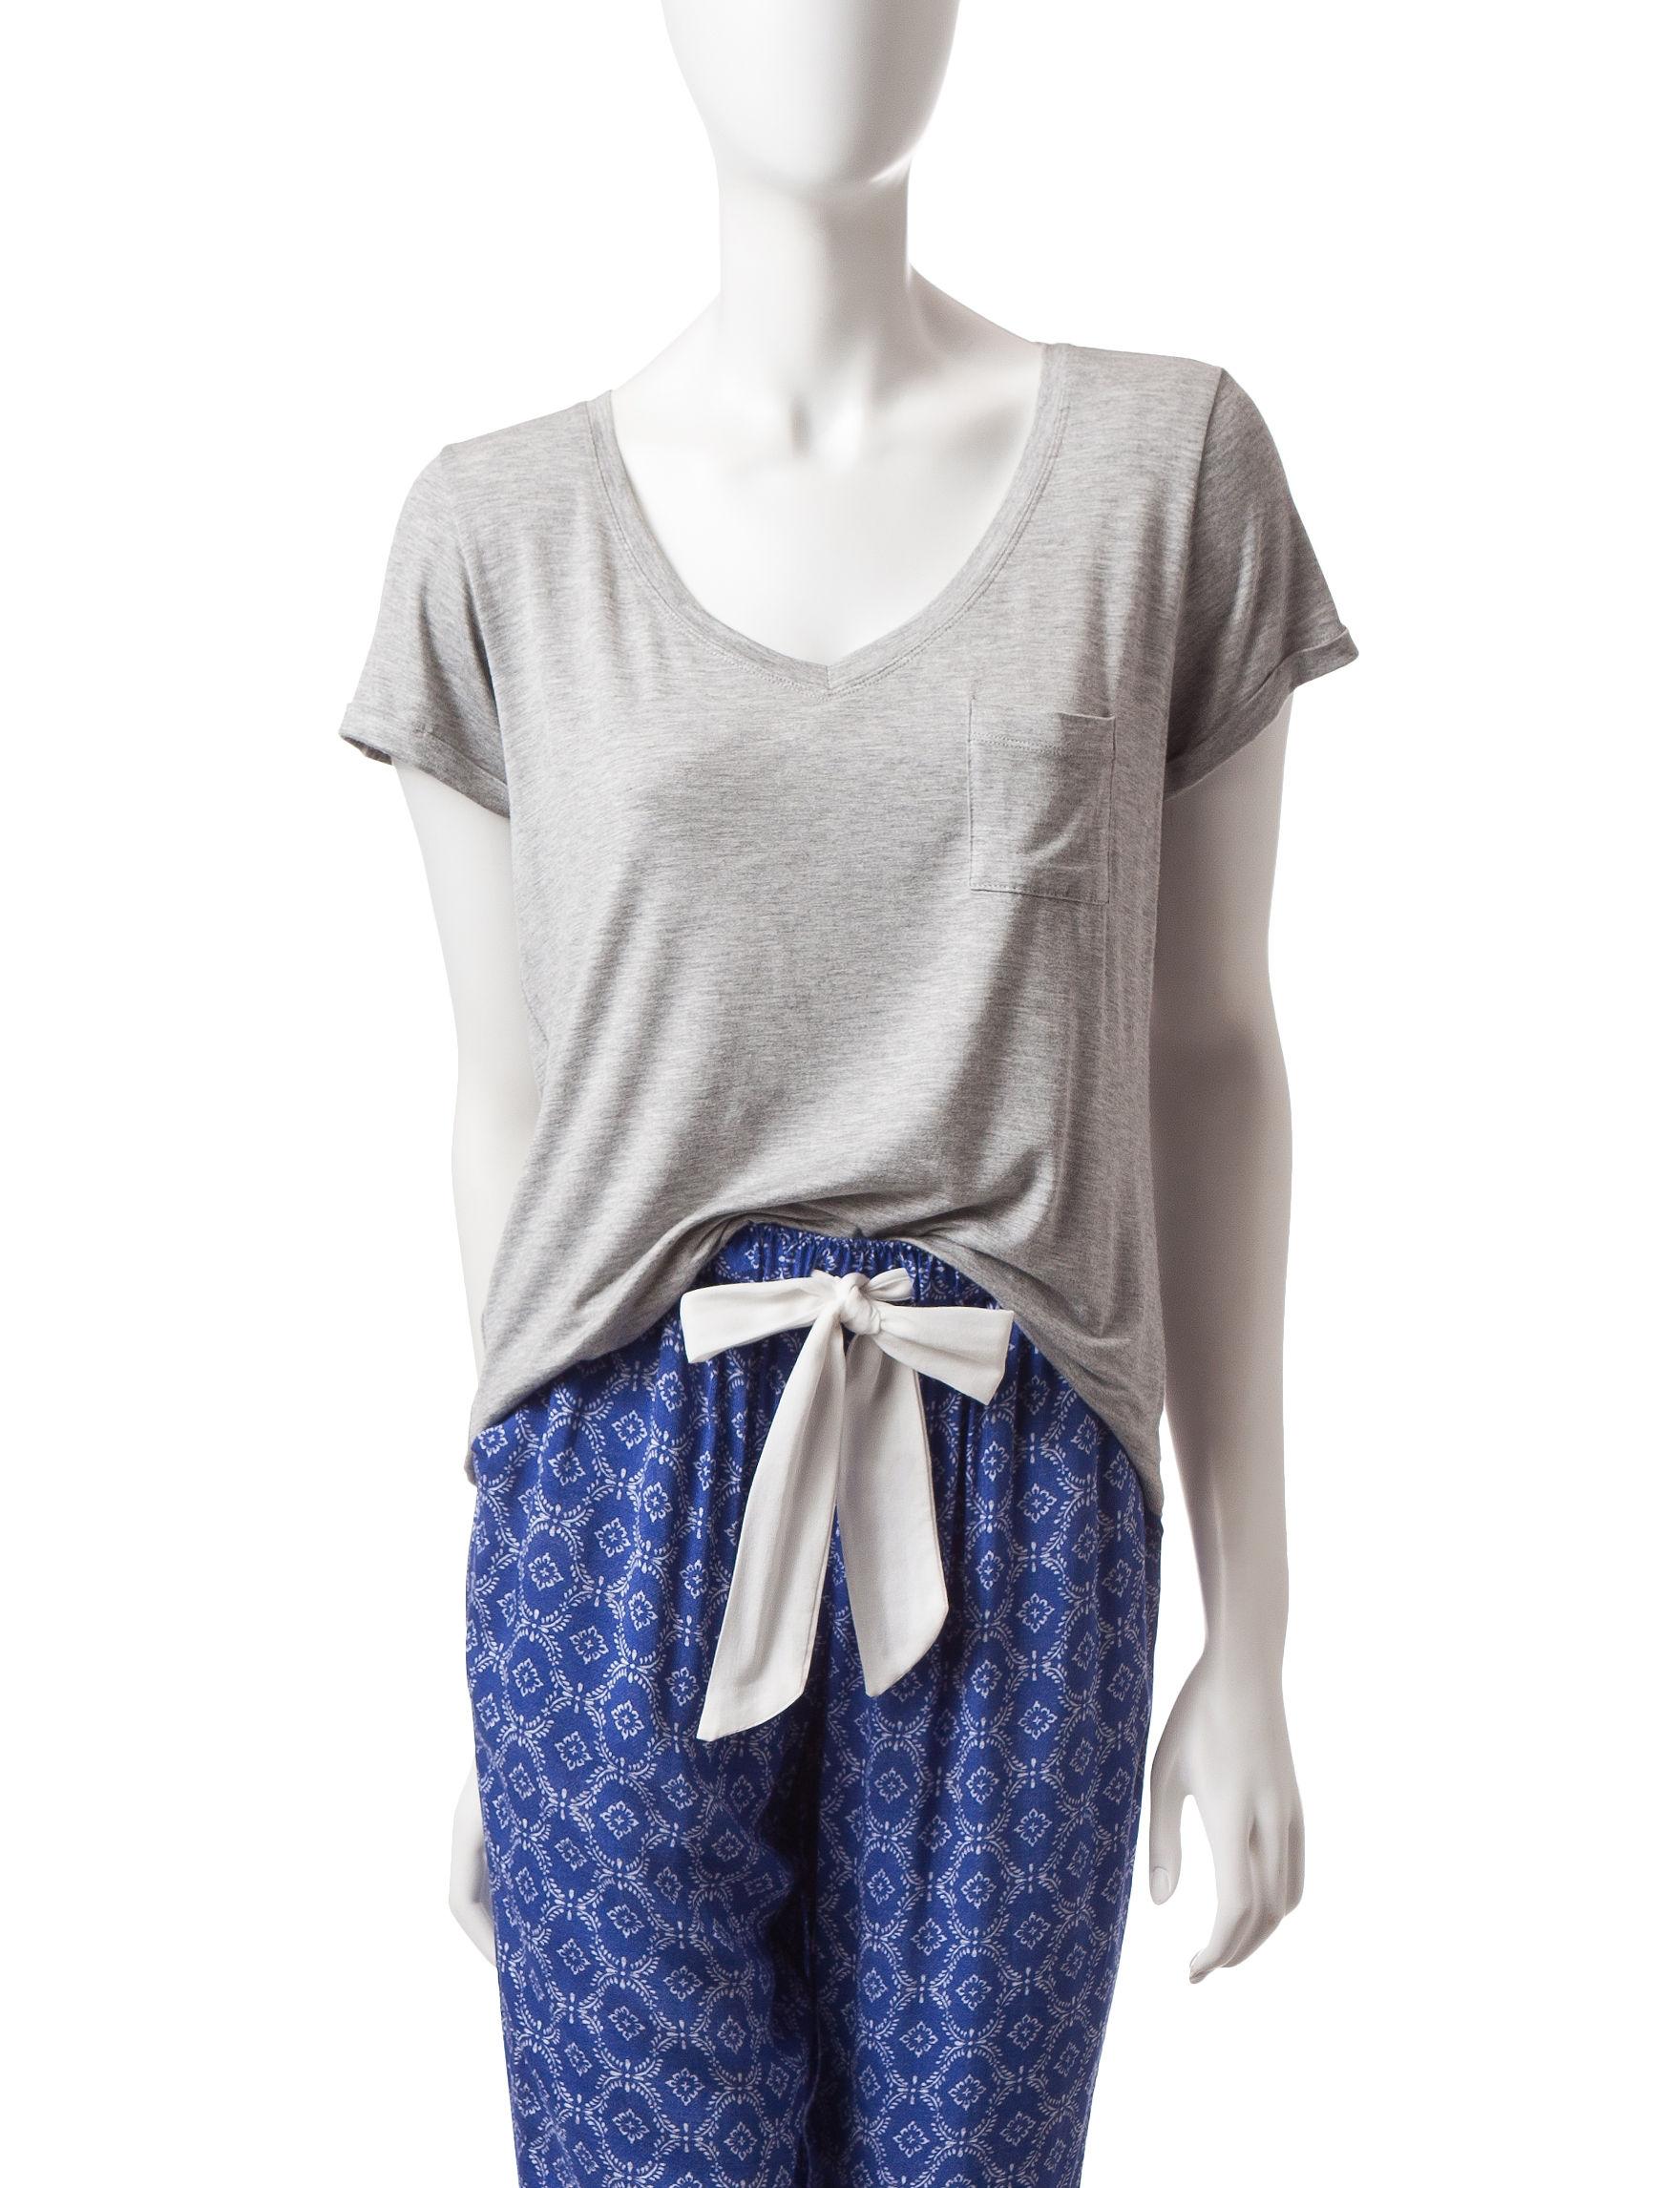 Laura Ashley Heather Grey Pajama Tops